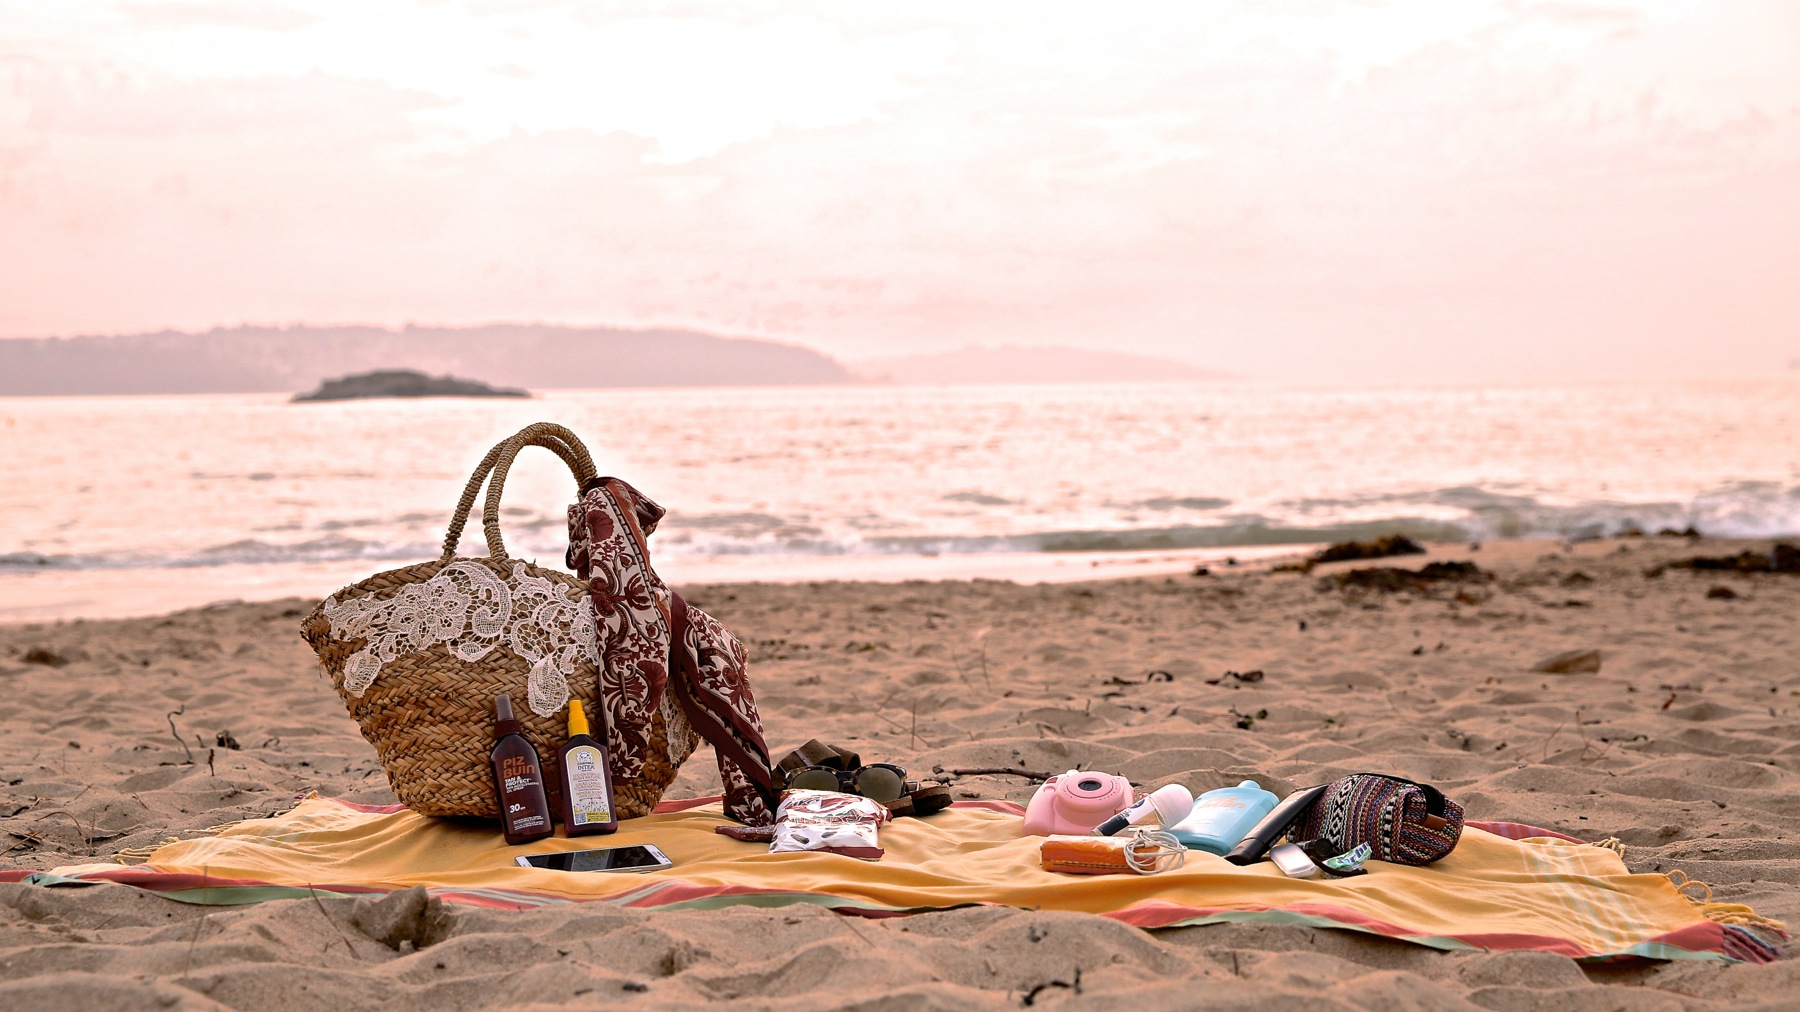 trendy_taste-look-outfit-street_style-boho-ootd-blog-blogger-fashion_spain-moda_españa-verano-crochet-vestido-bikini-hippie-dress-galicia-sunset-puesta_de_sol-piz_buin-2